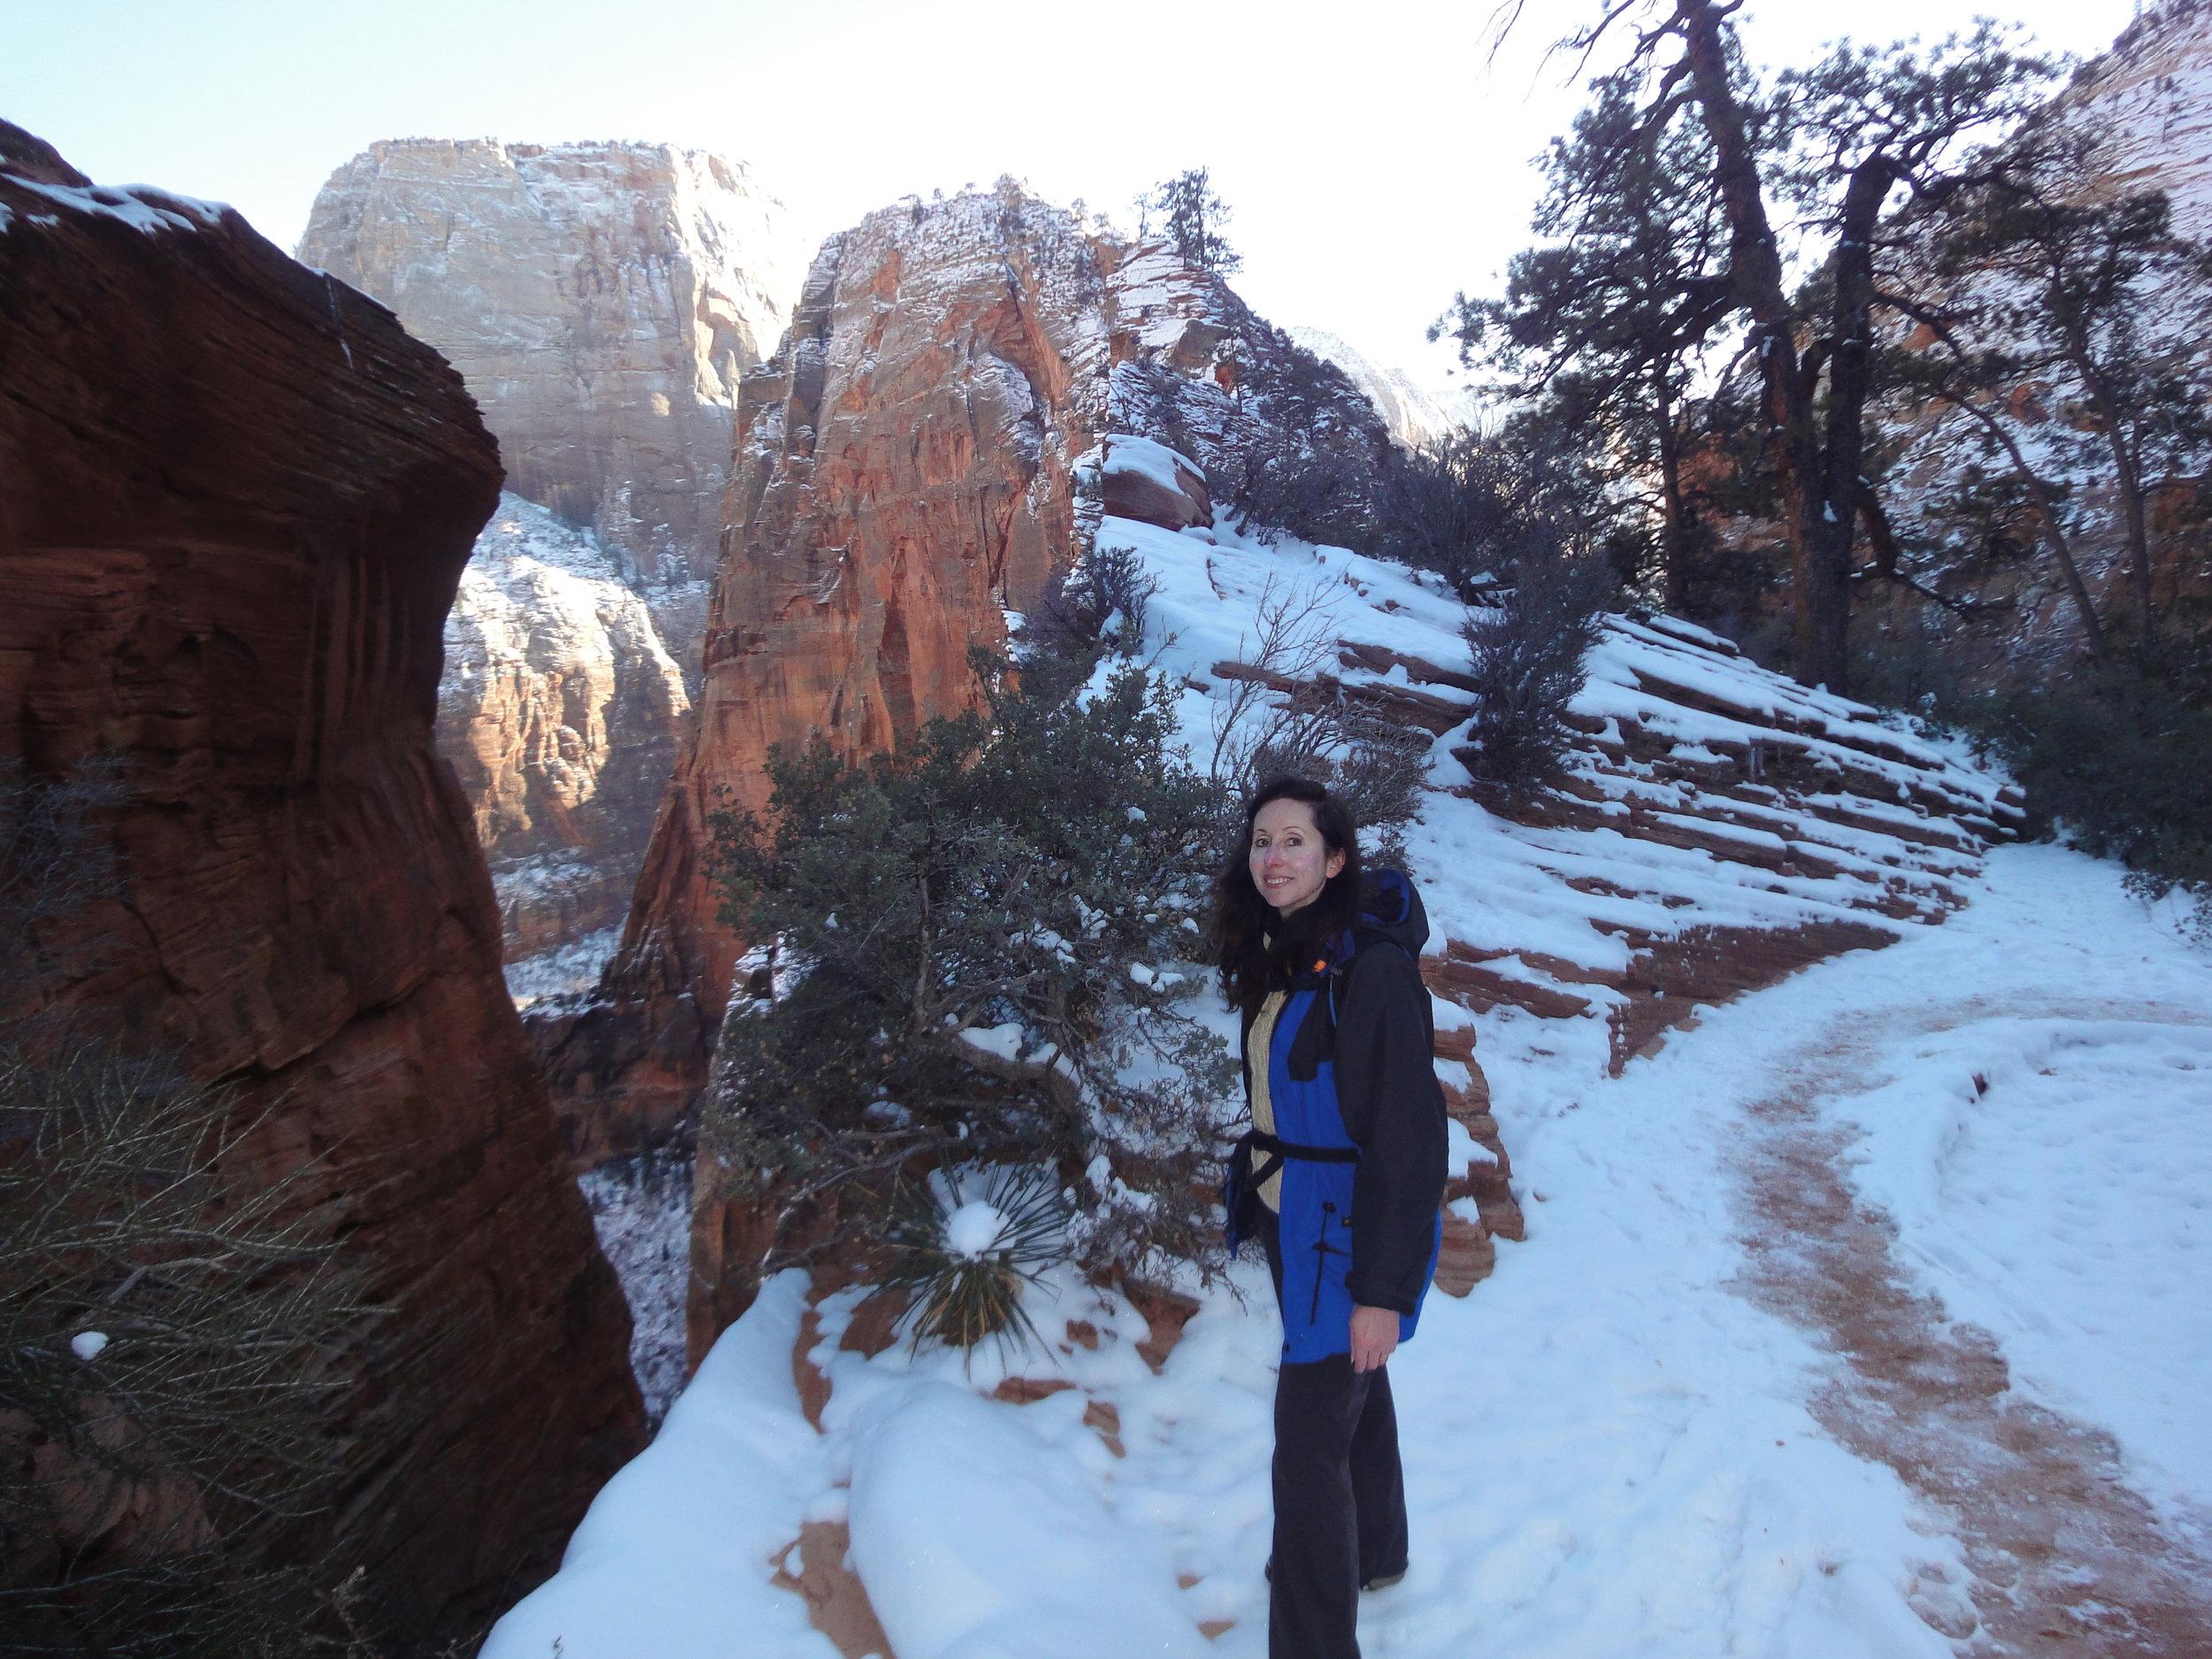 Enjoying the scenery, winter at Angel's Landing, Zion National Park, Utah